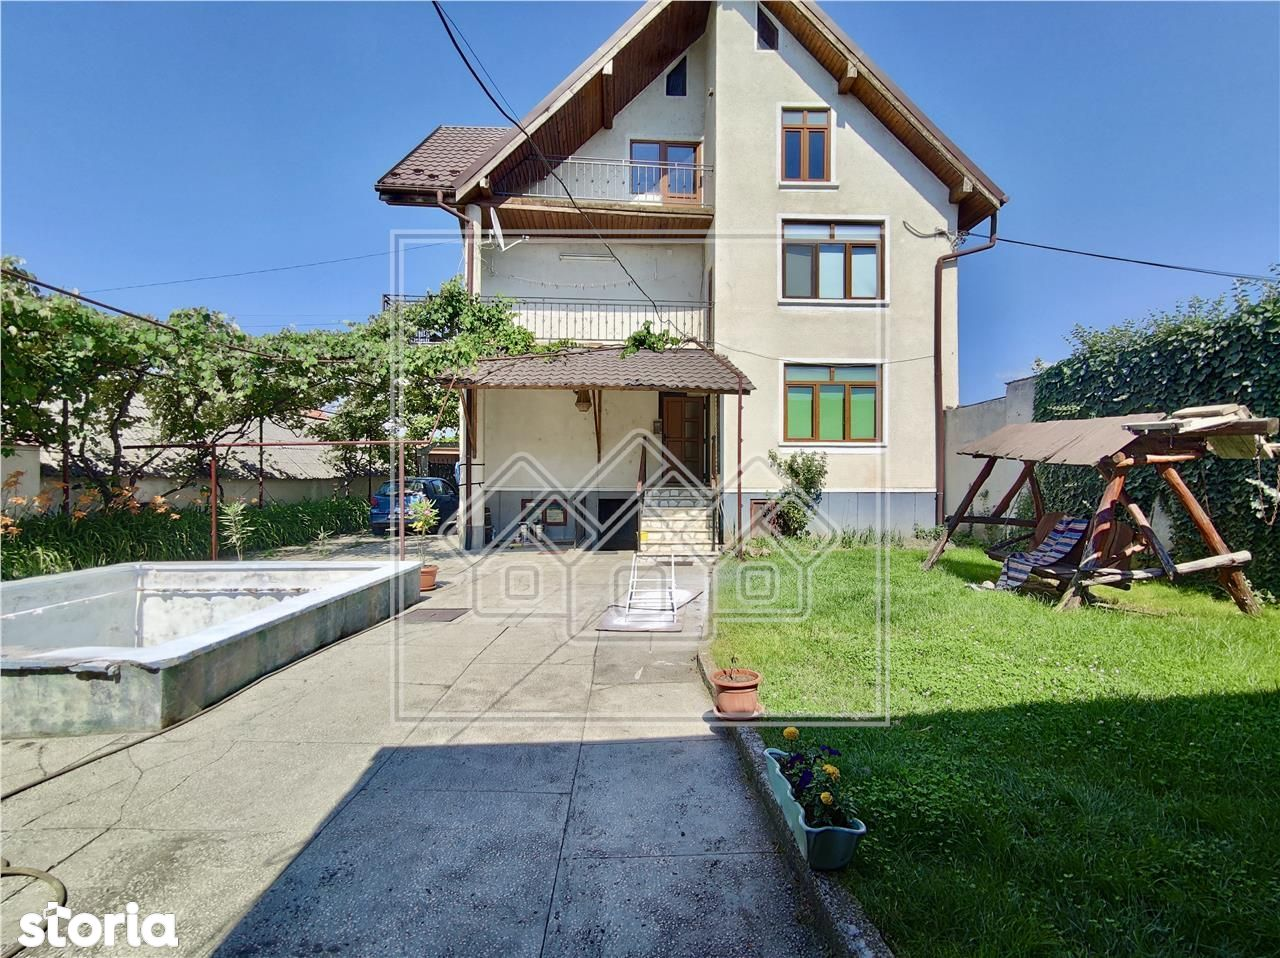 Casa individuala in Avrig - cu pivnita si piscina, teren 450 mp